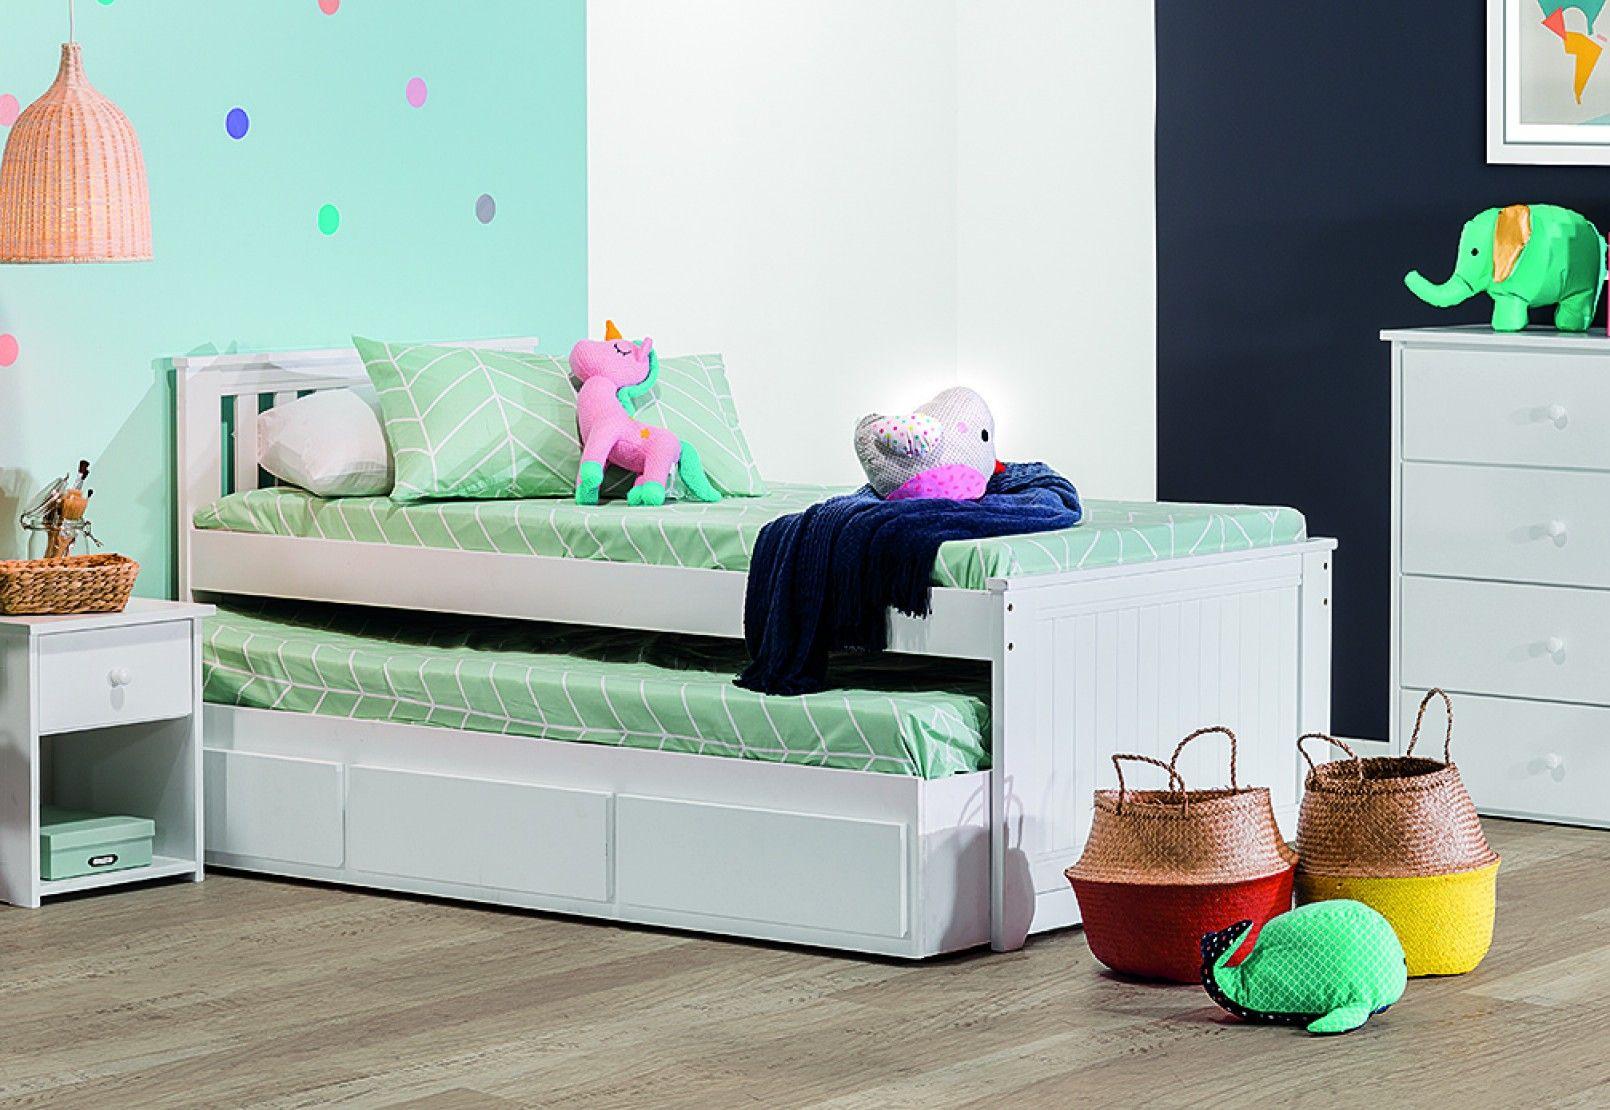 Best Captain Jack Single Trundle Bed Bedroom Diy Bedroom Design Diy 400 x 300